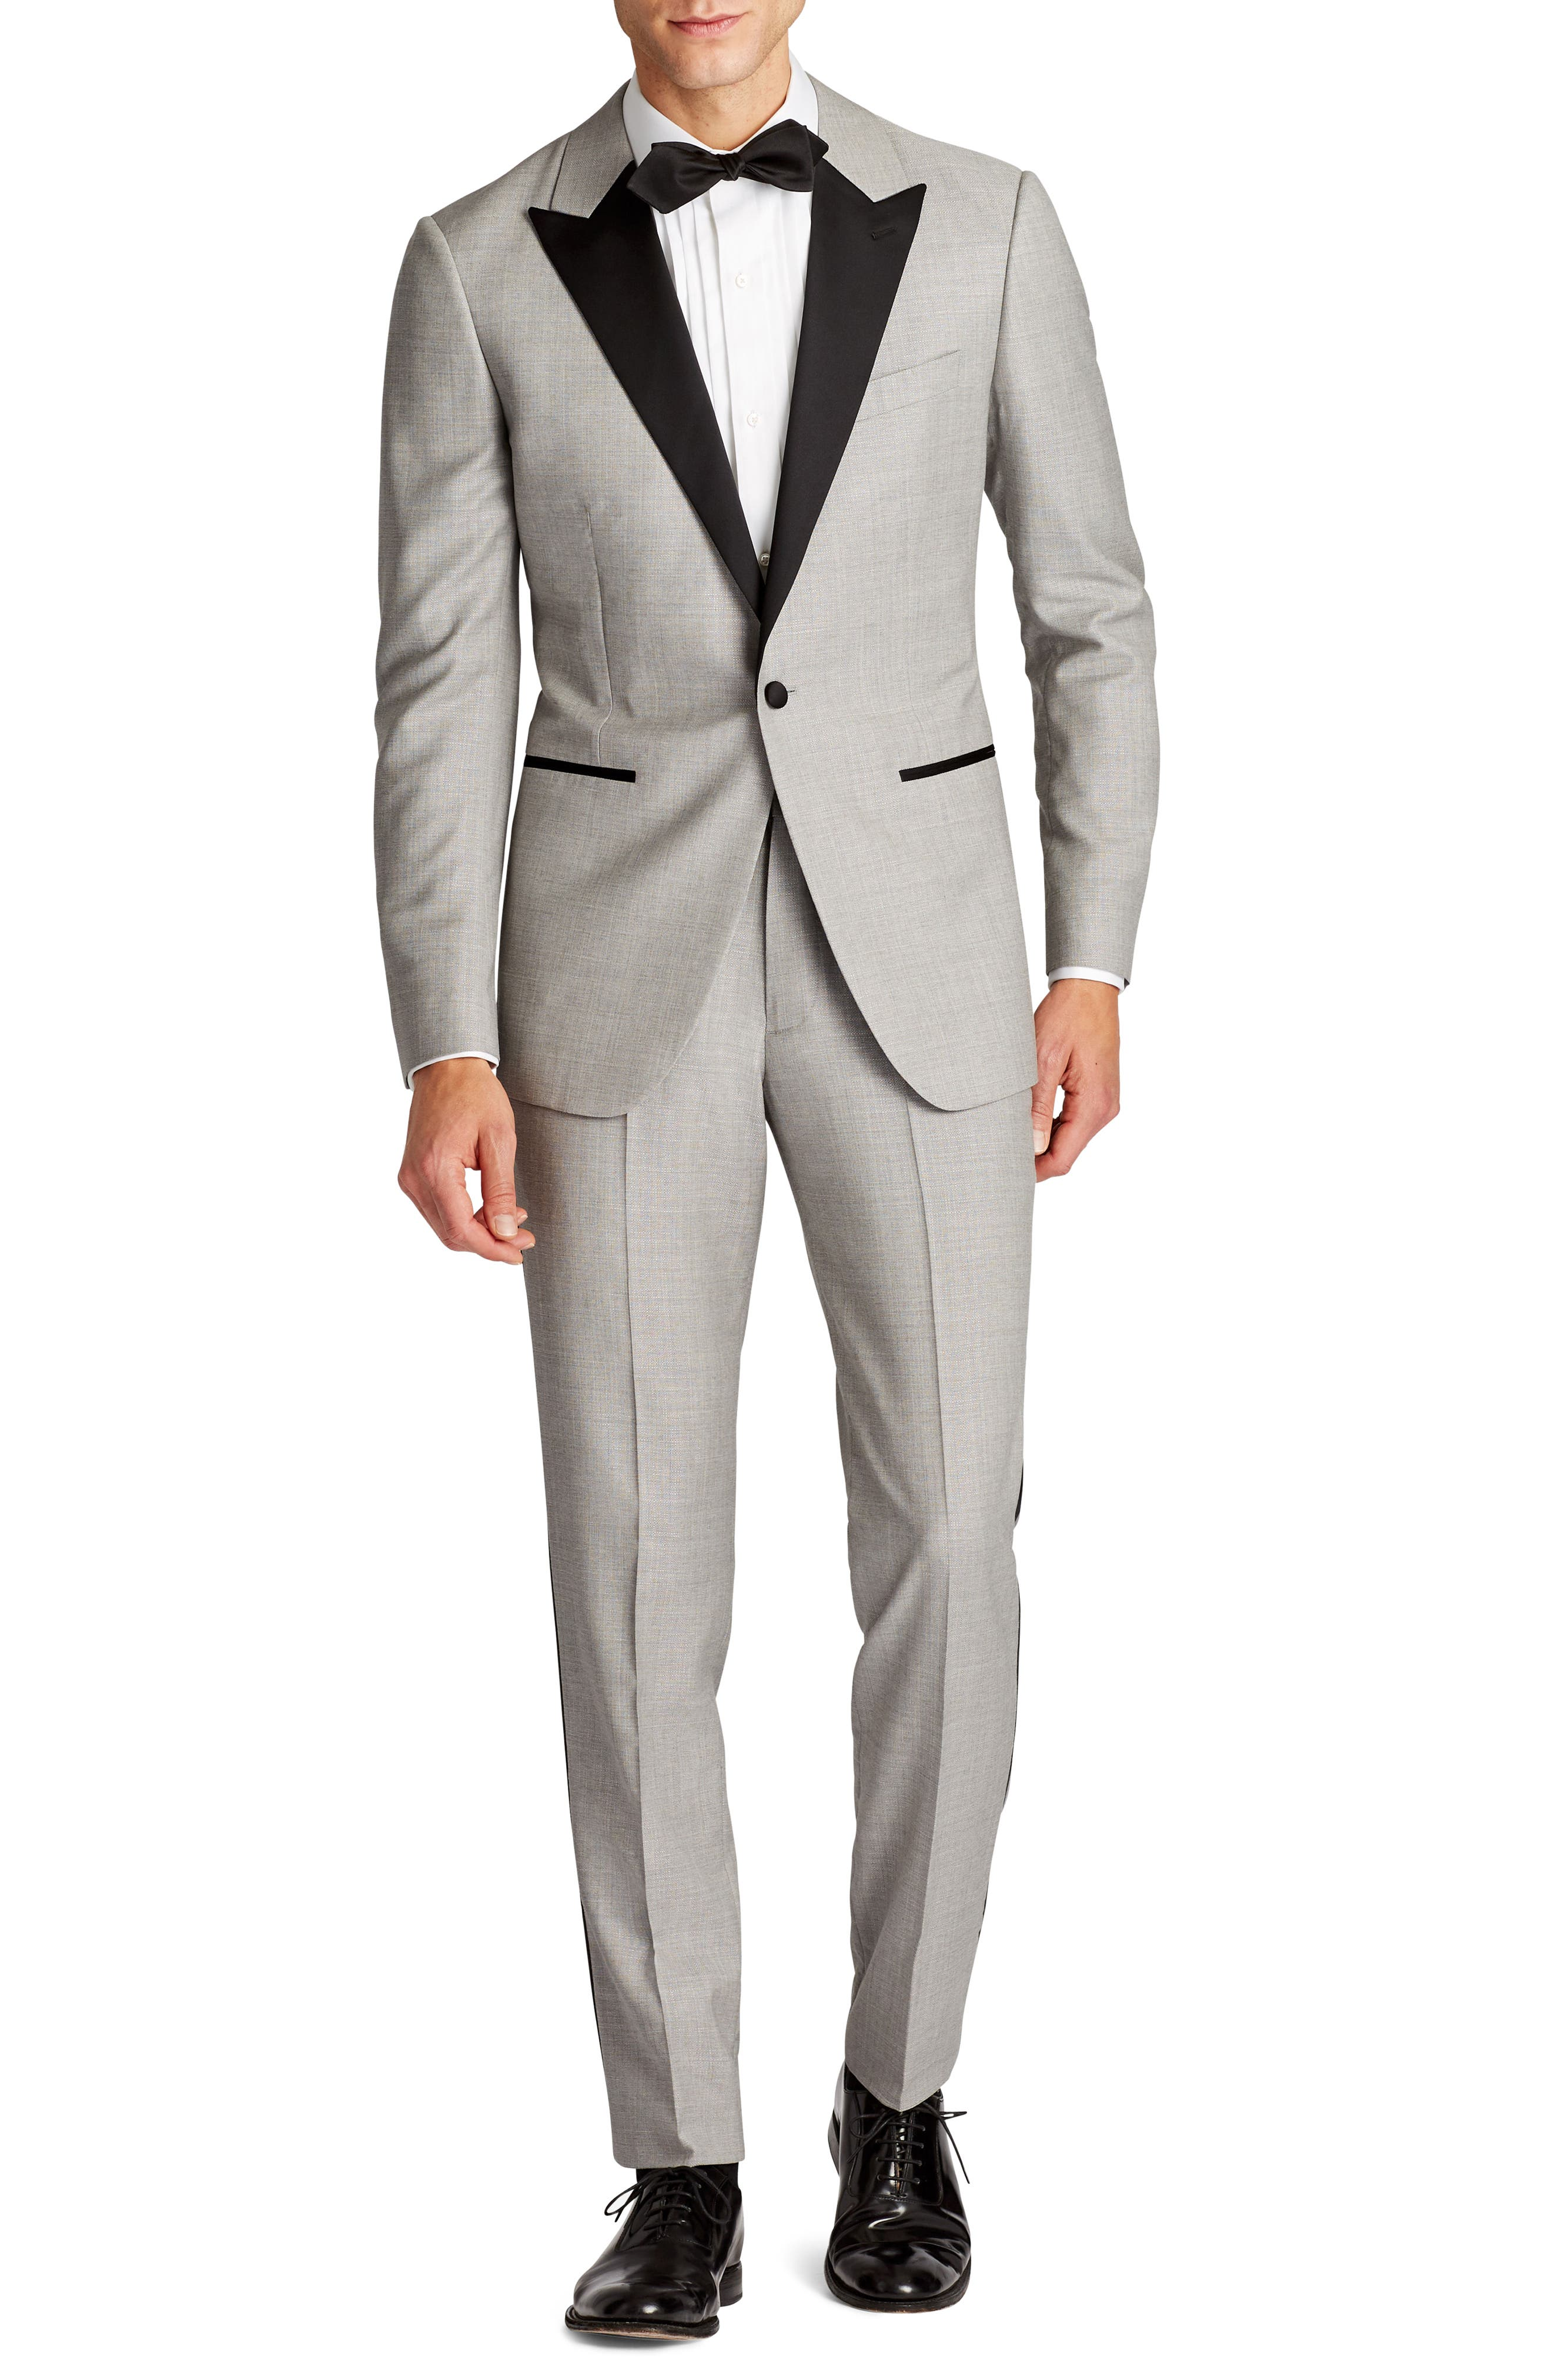 Capstone Flat Front Tuxedo Trousers,                             Alternate thumbnail 4, color,                             Pearl Grey